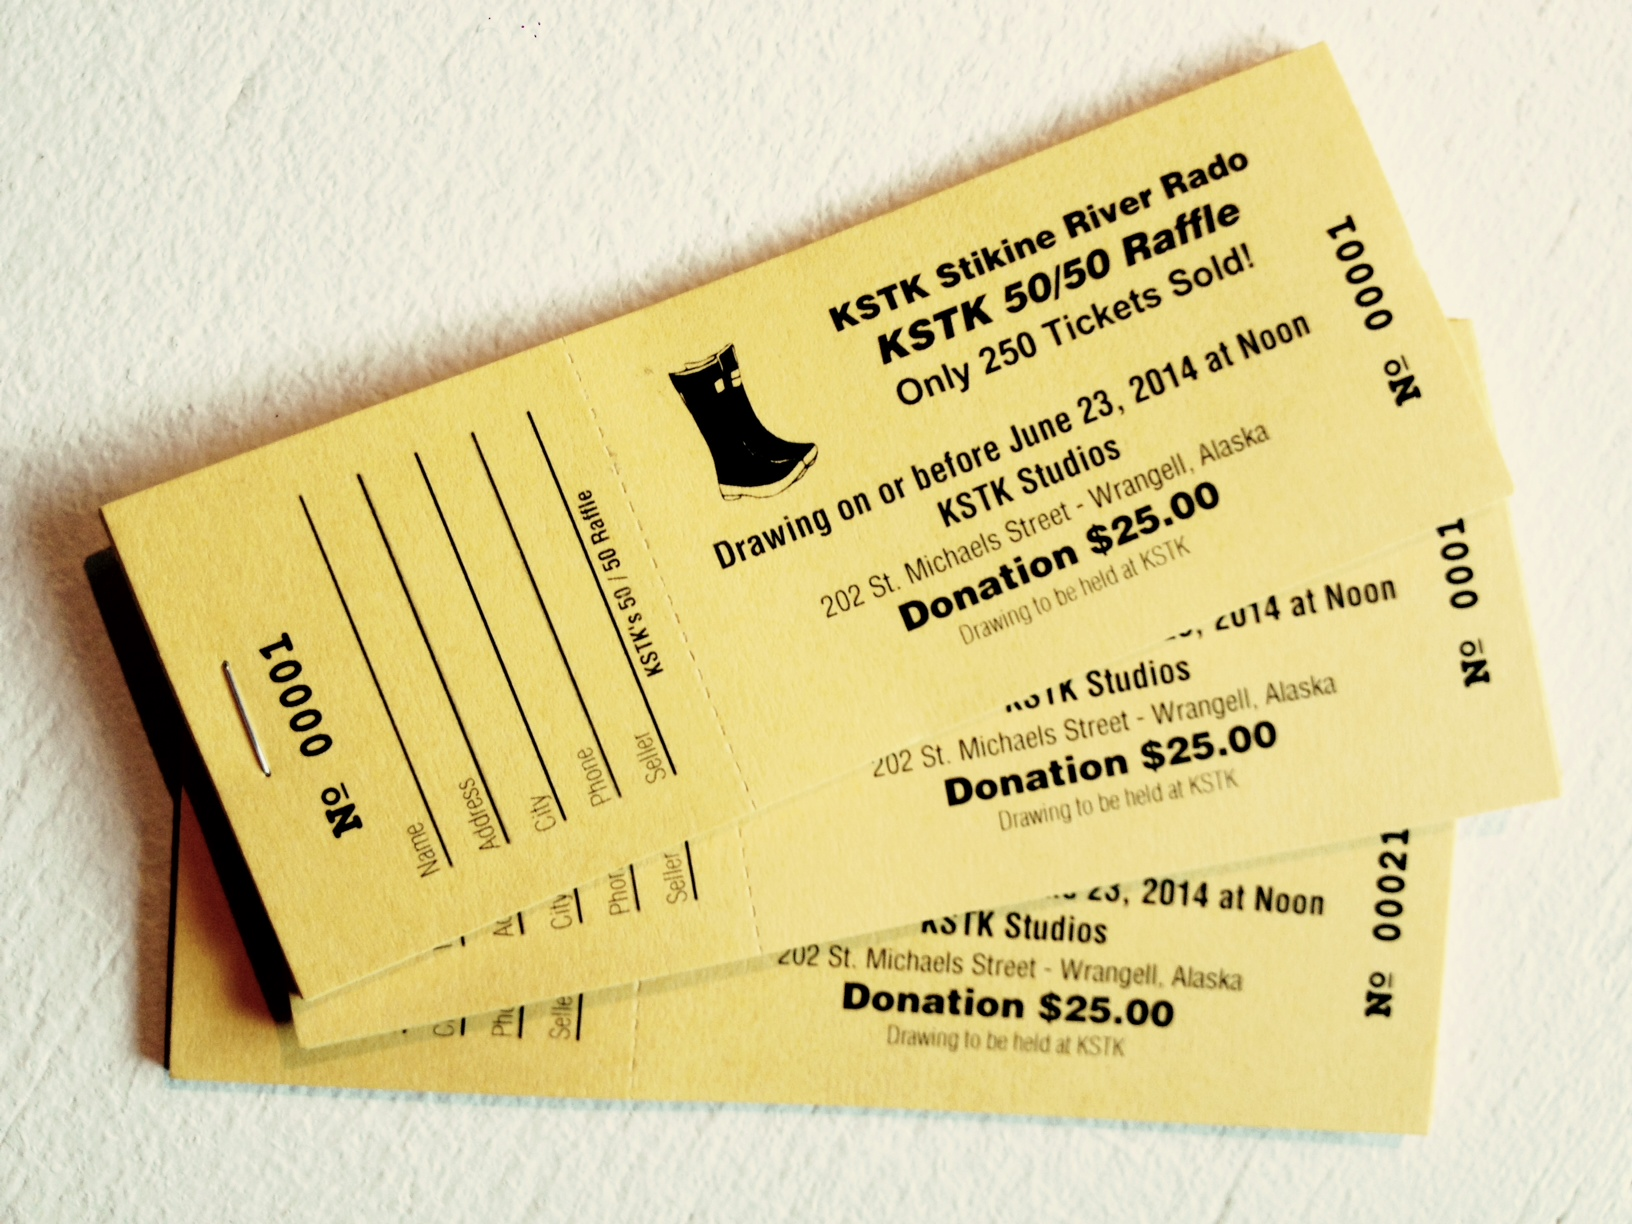 Evans Print & Media Group · Raffle Tickets